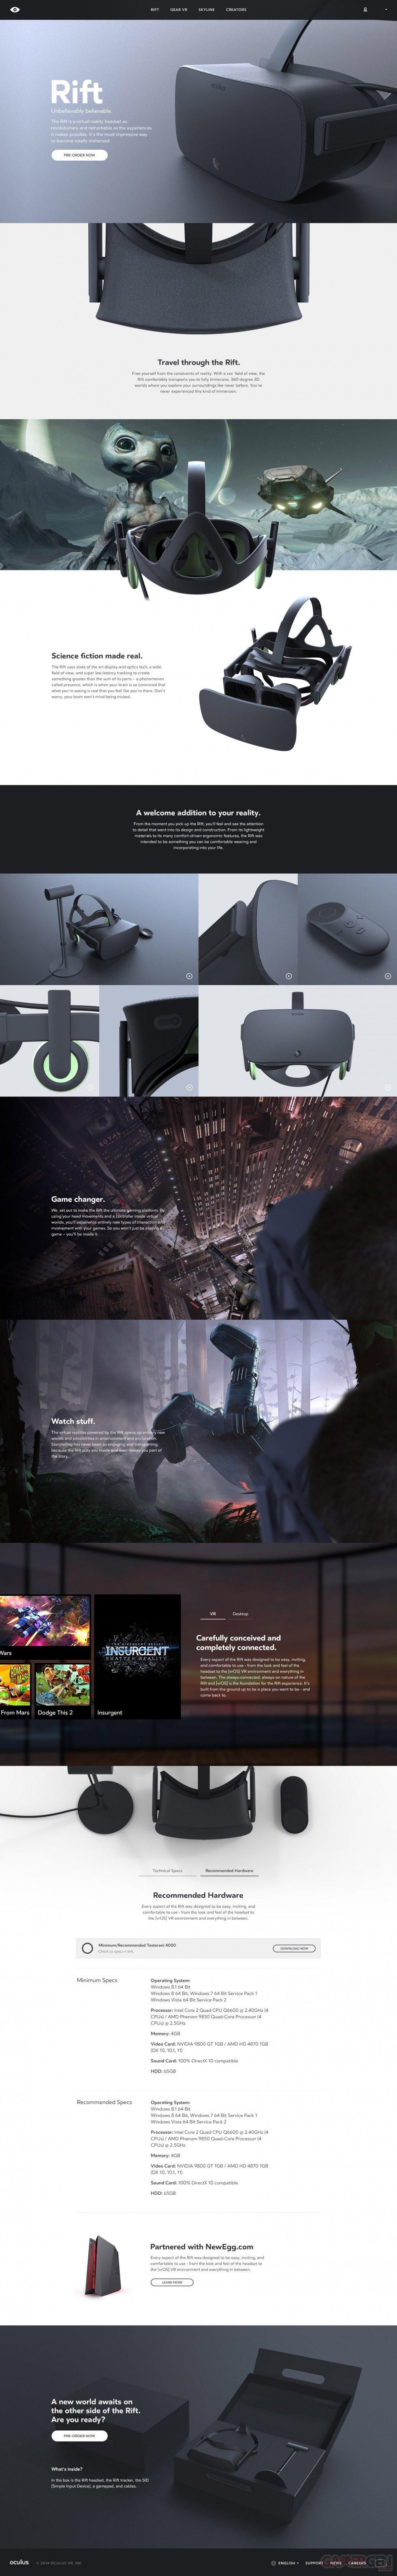 [VR] Oculus Rift, HTC Vive, Playstation VR & co - Page 5 Oculus-rift-version-commerciale-7_0903D4000000808473